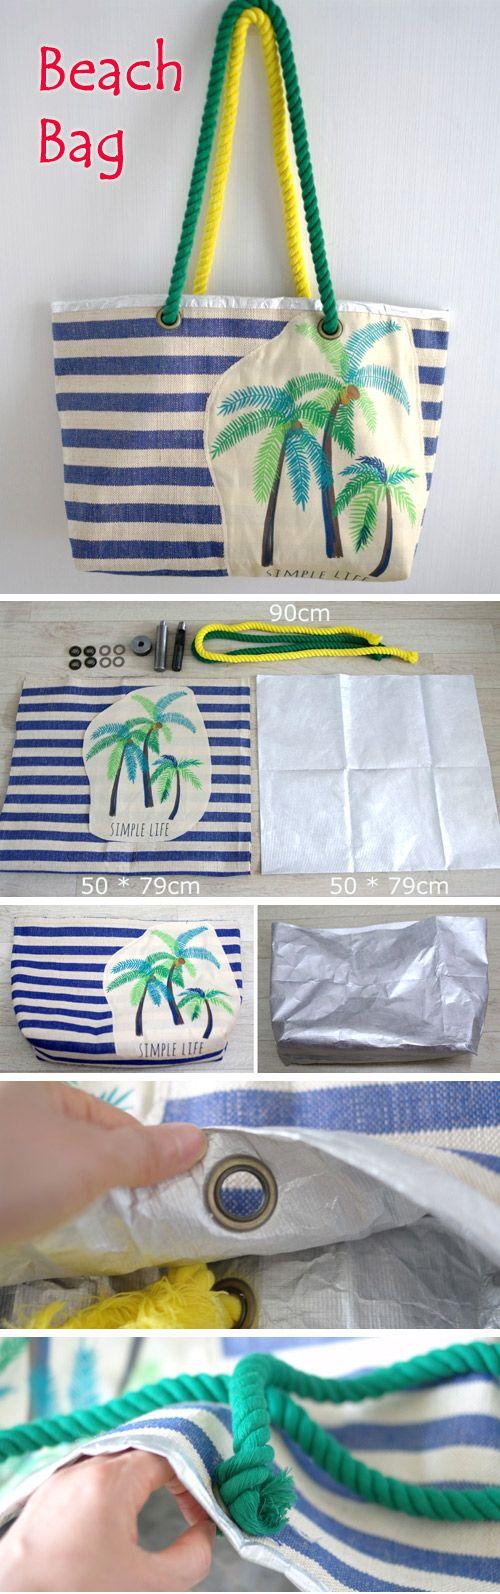 Beach bag made from fabric and waterproof foil. DIY Photo Tutorial. http://www.free-tutorial.net/2016/12/hawaiian-beach-bag.html